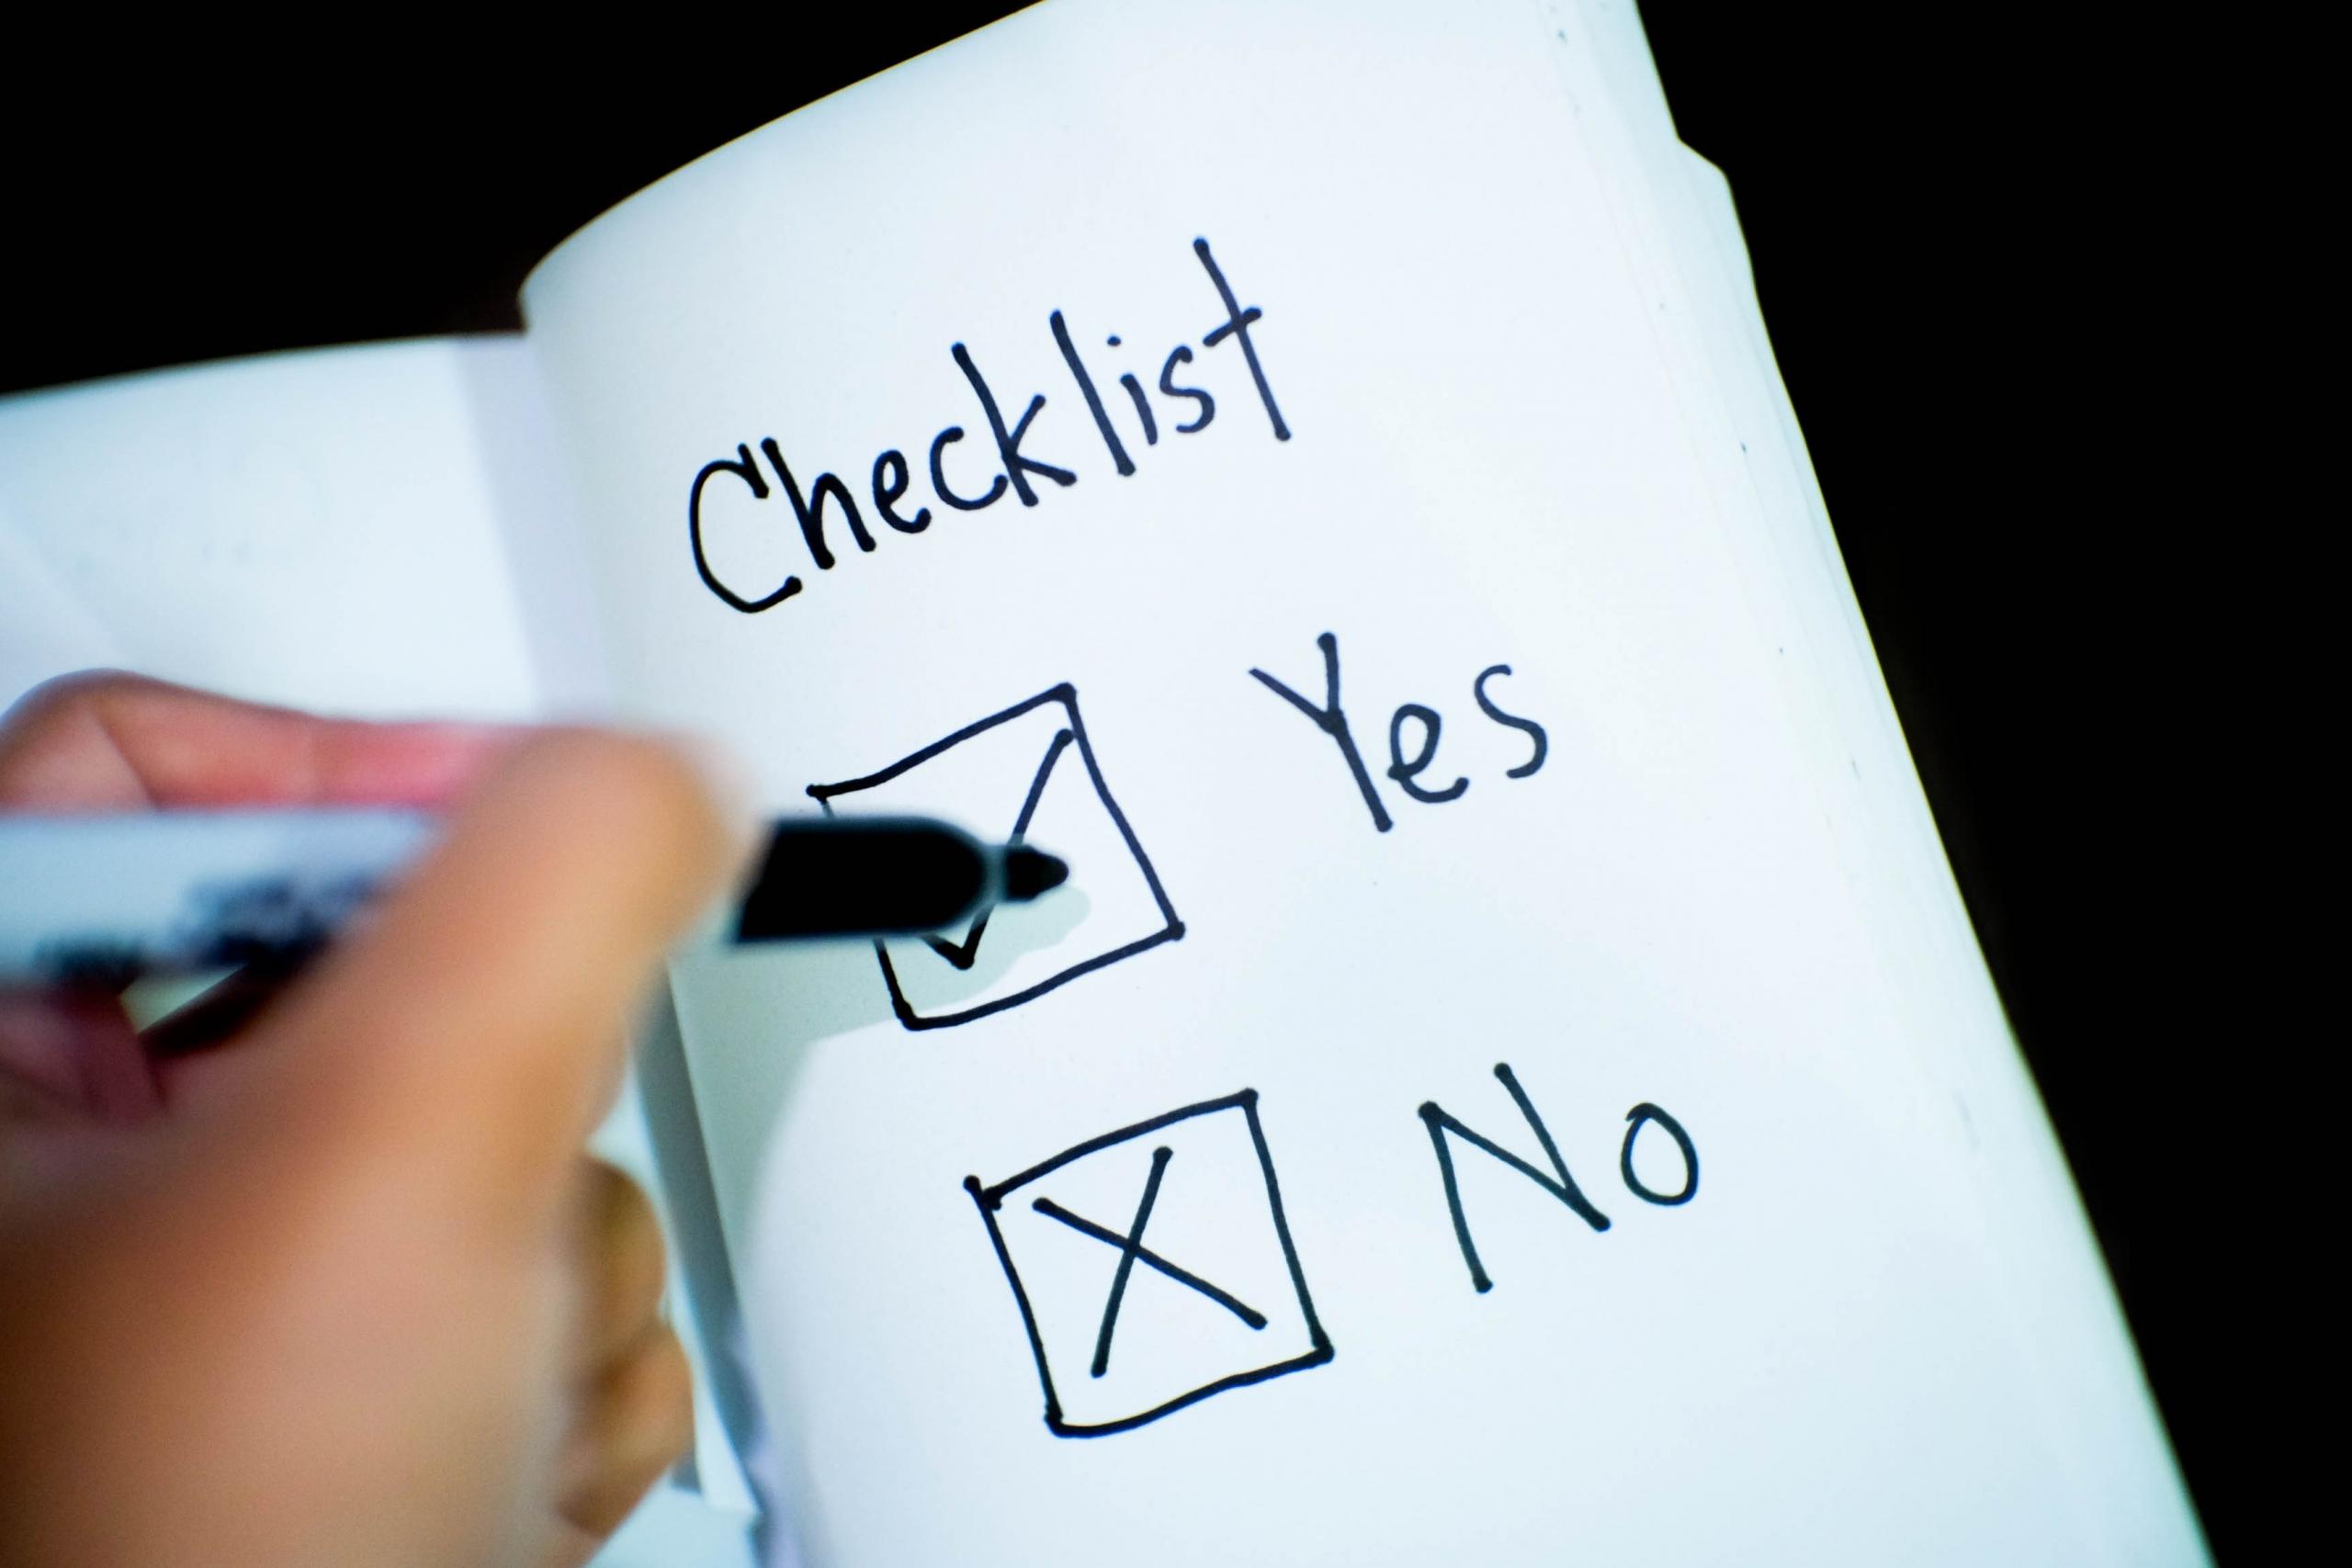 checkliste scaled